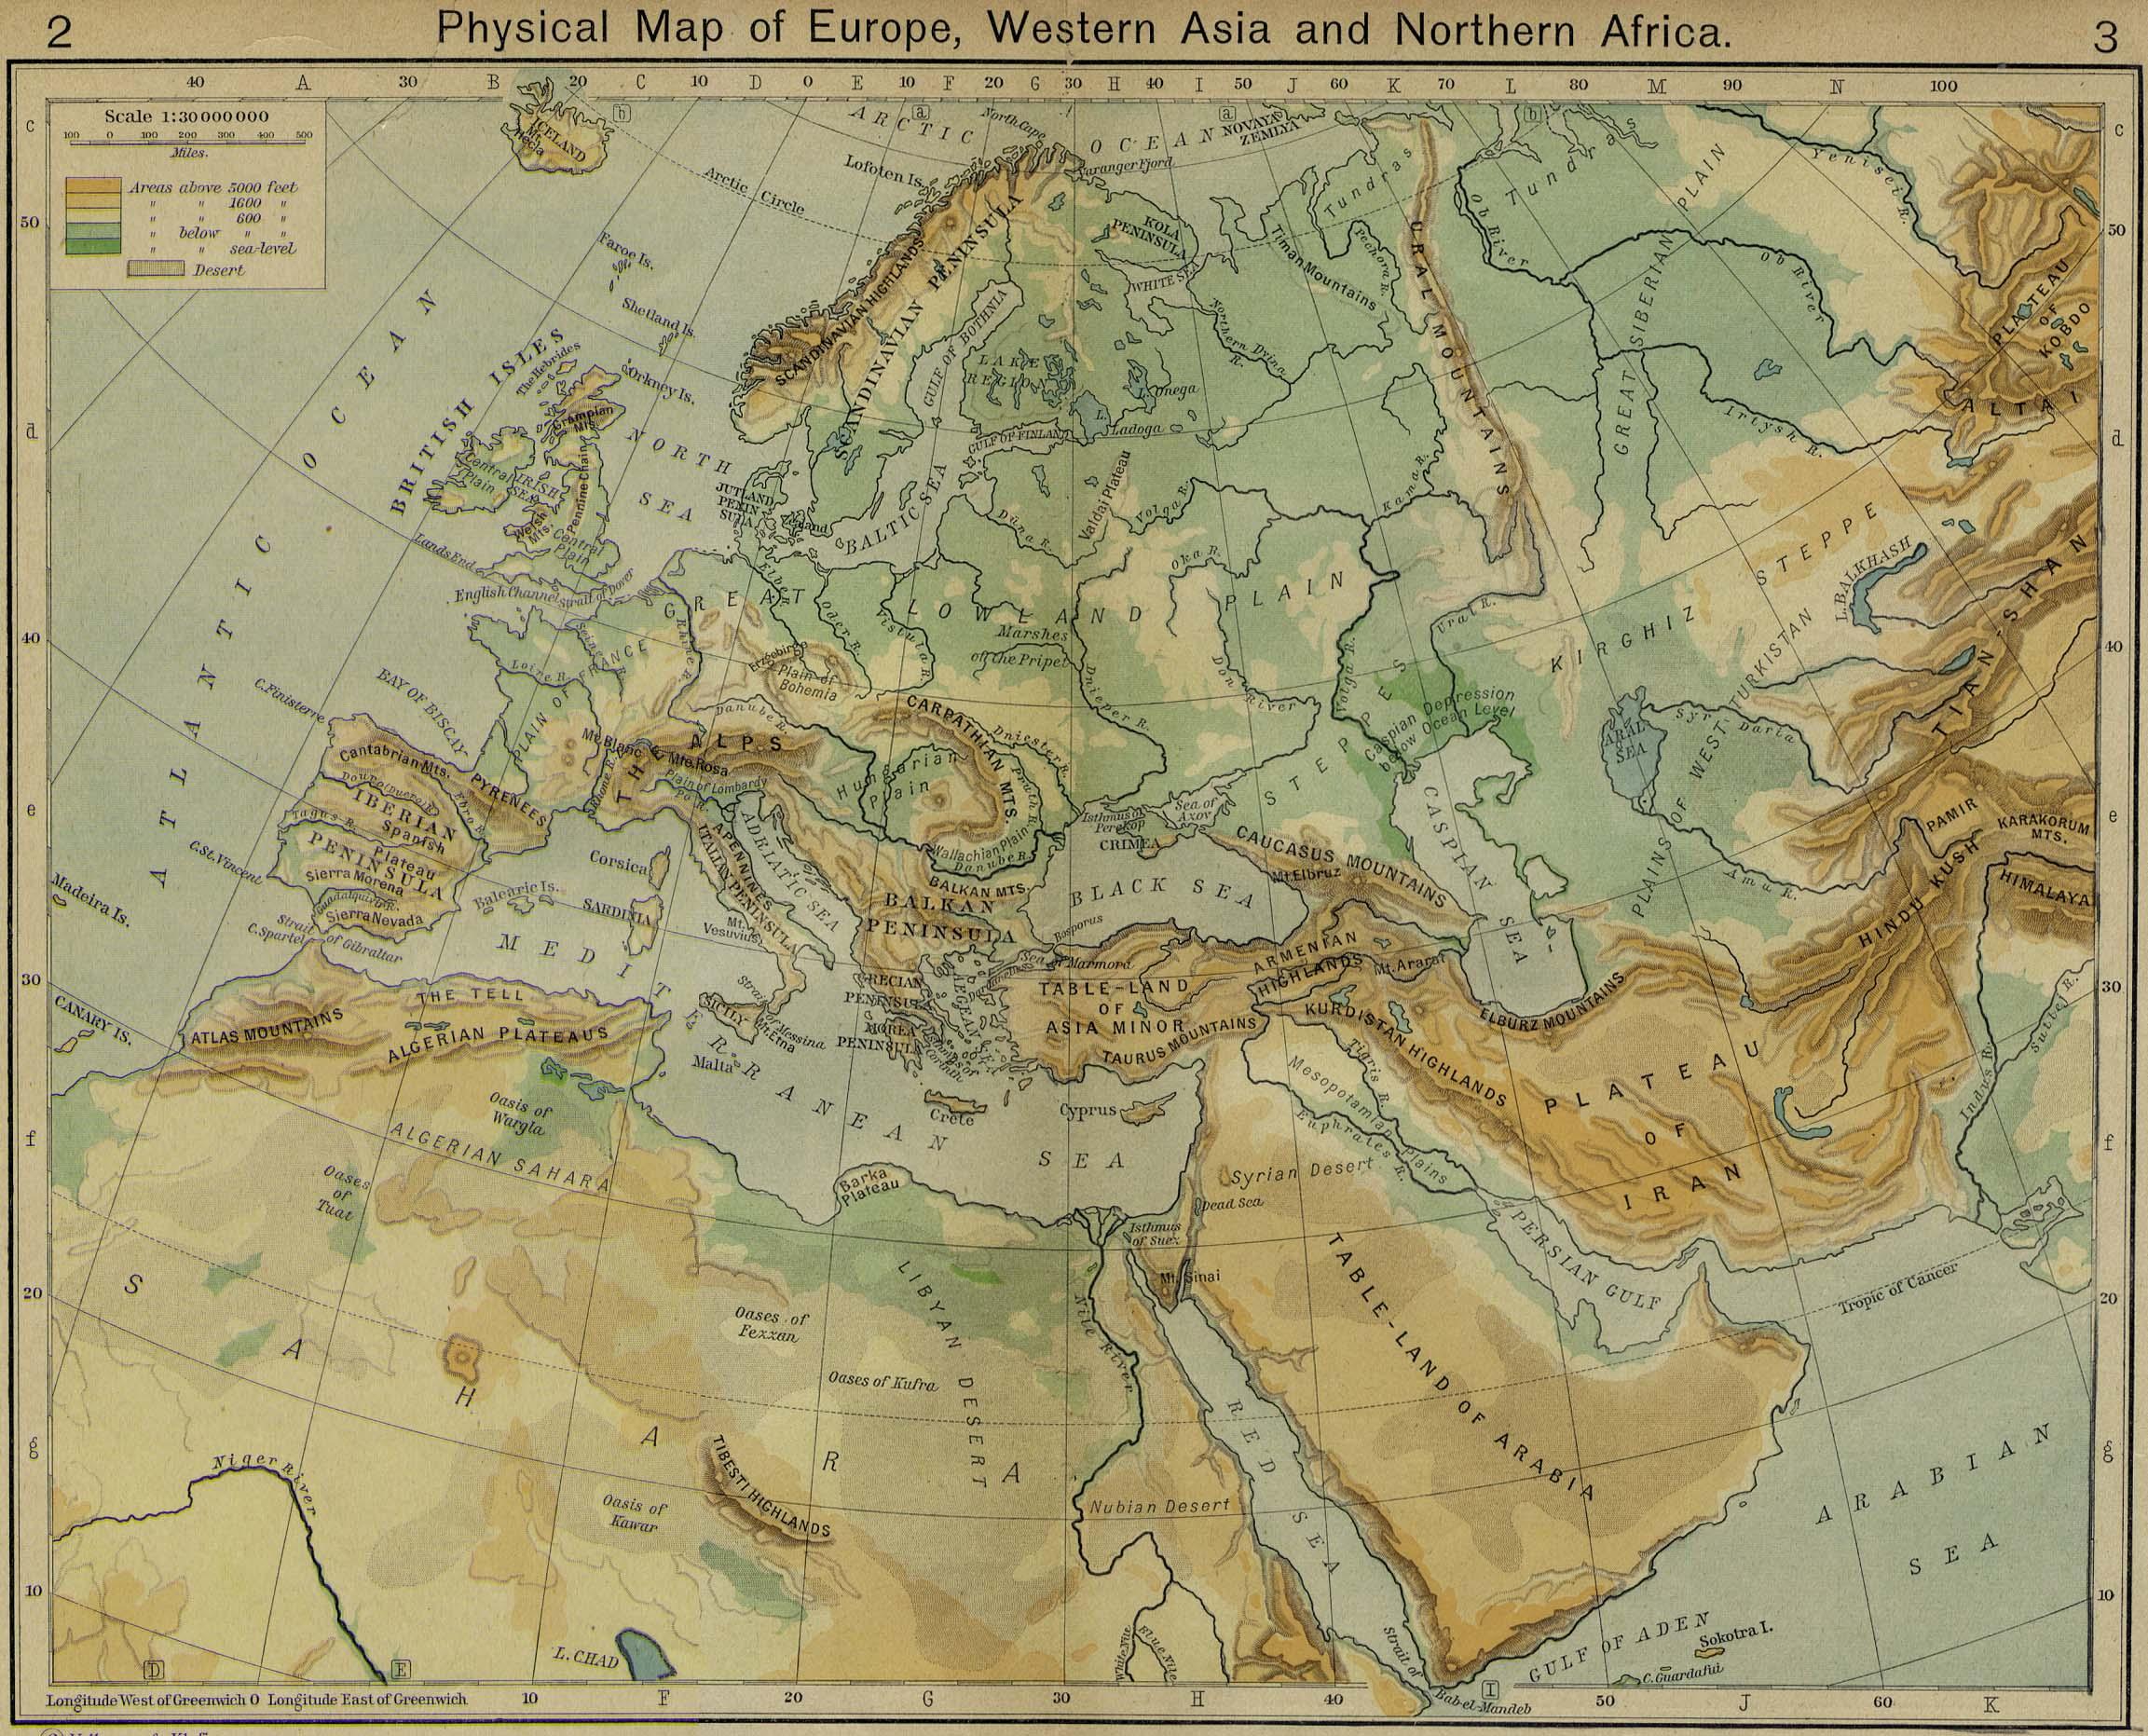 Swartzentrovercom Historical Atlas